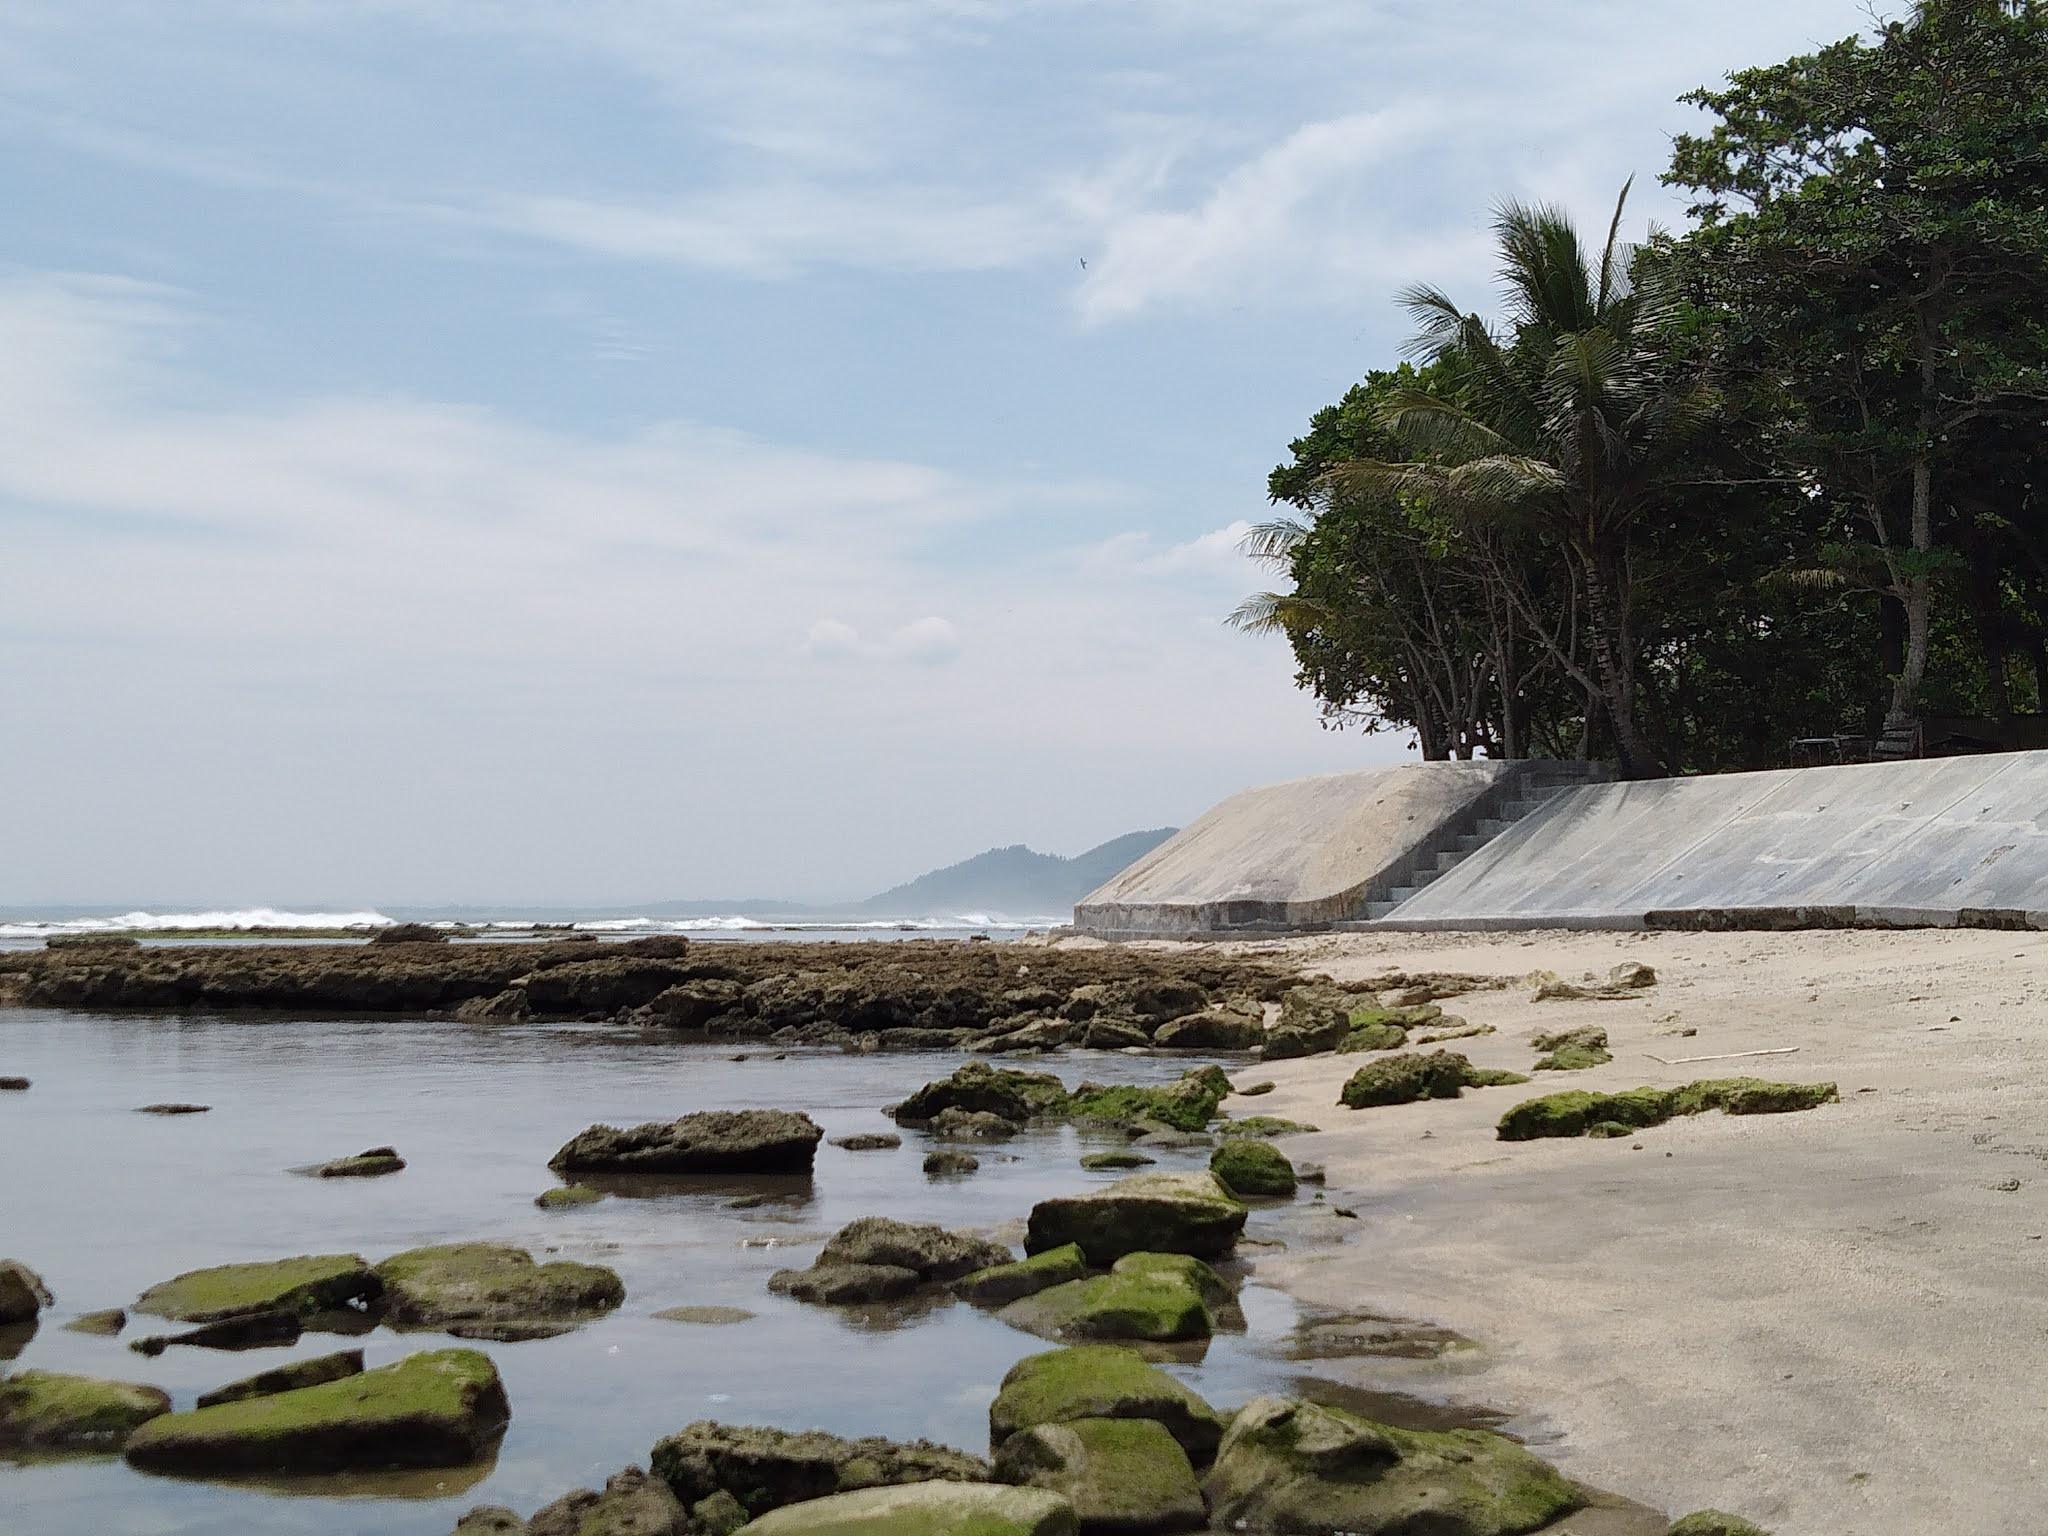 pantai karapyak lokasi pertama